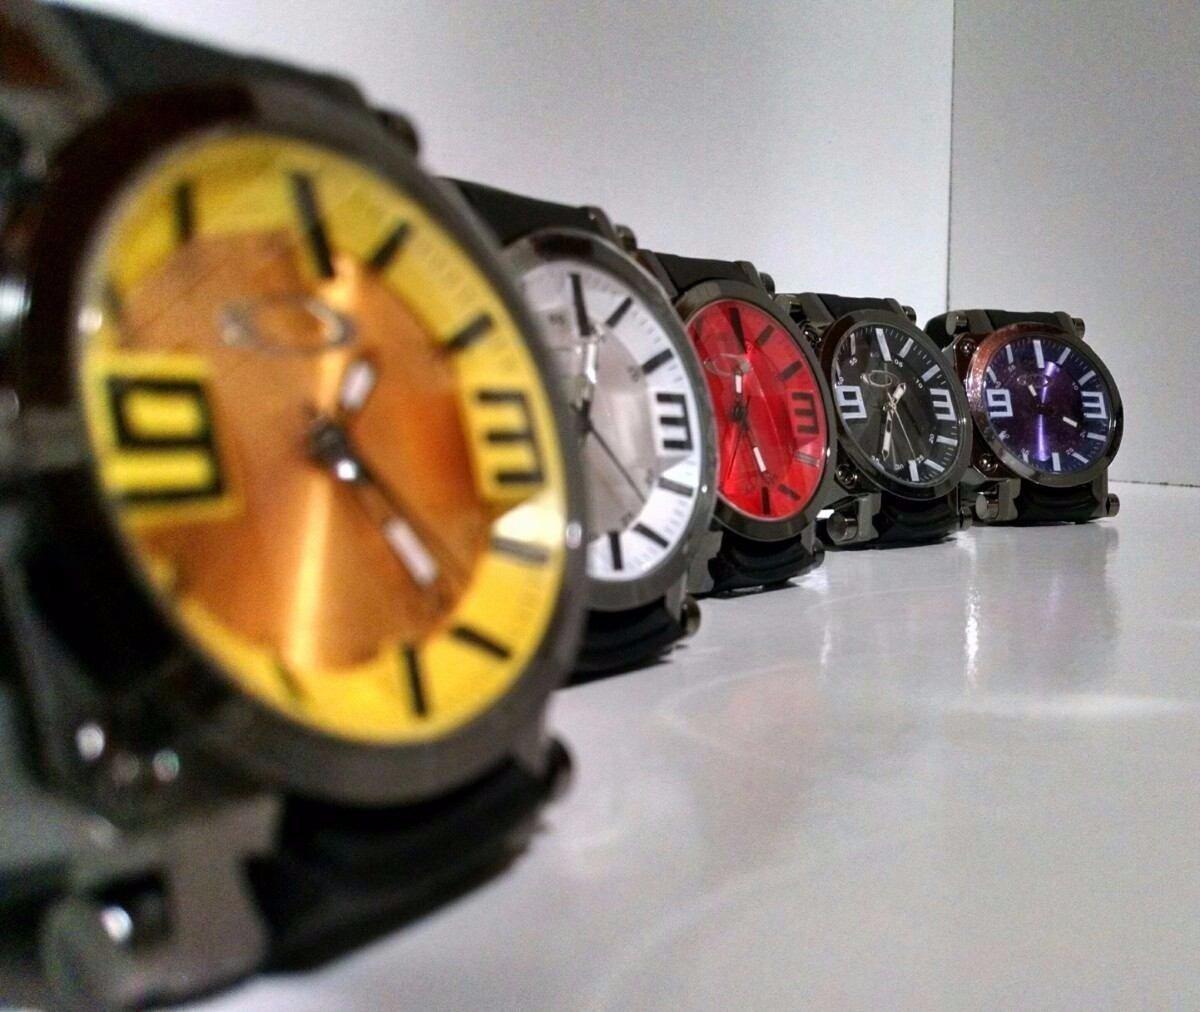 Relógio Oakley Gearbox Titanium Á Prova D'Água Para todas as ocasiões